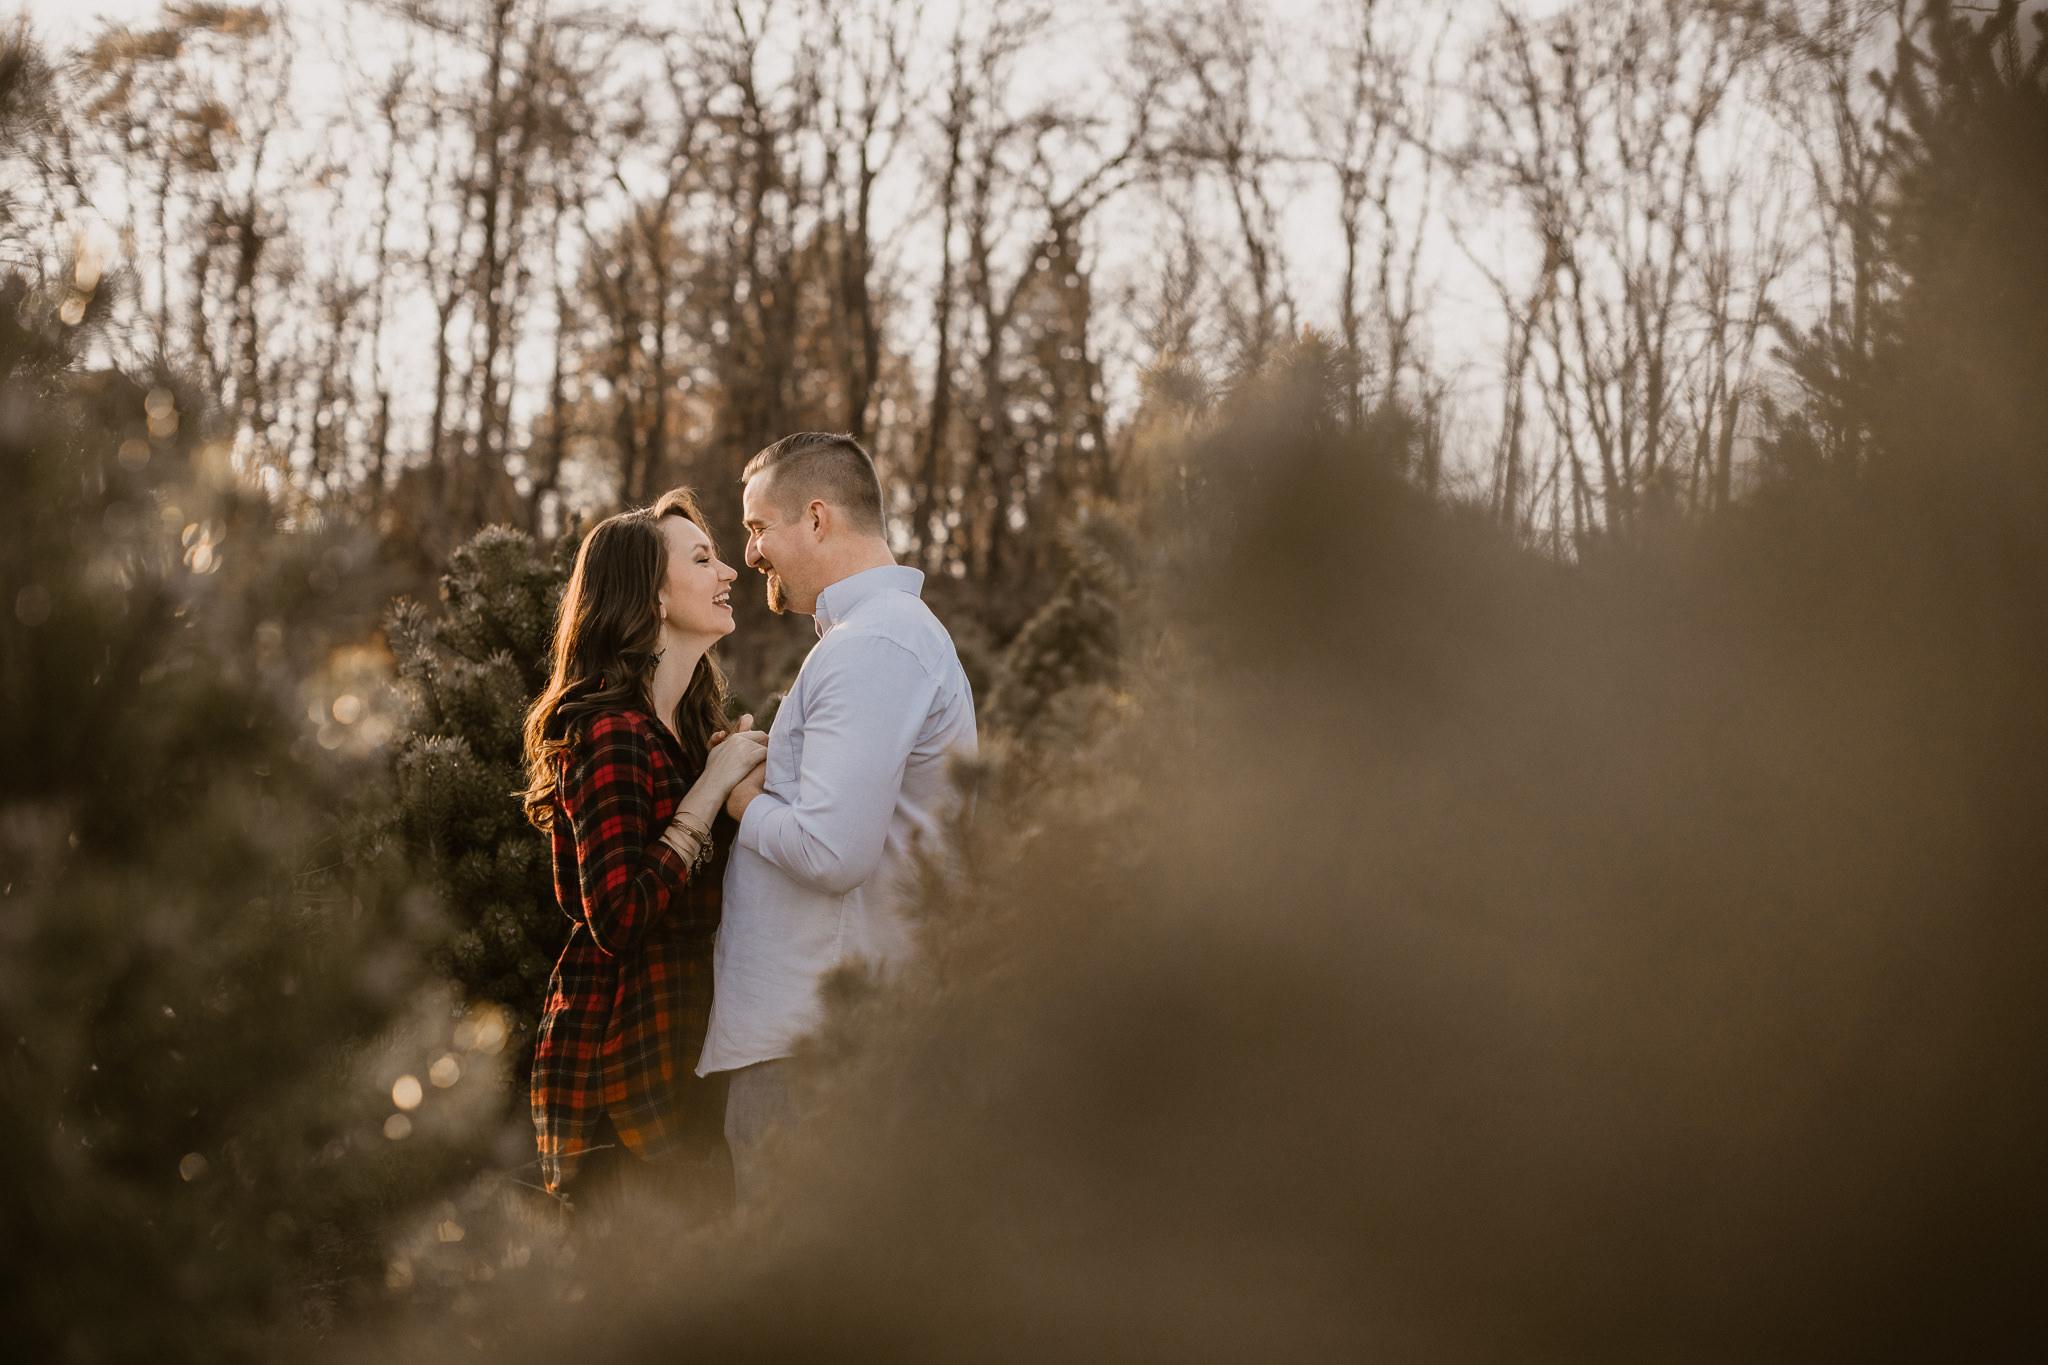 Engagement - Tree picking - Wedding Photographer - Virginia - Best - Pat Cori Photography-8.jpg